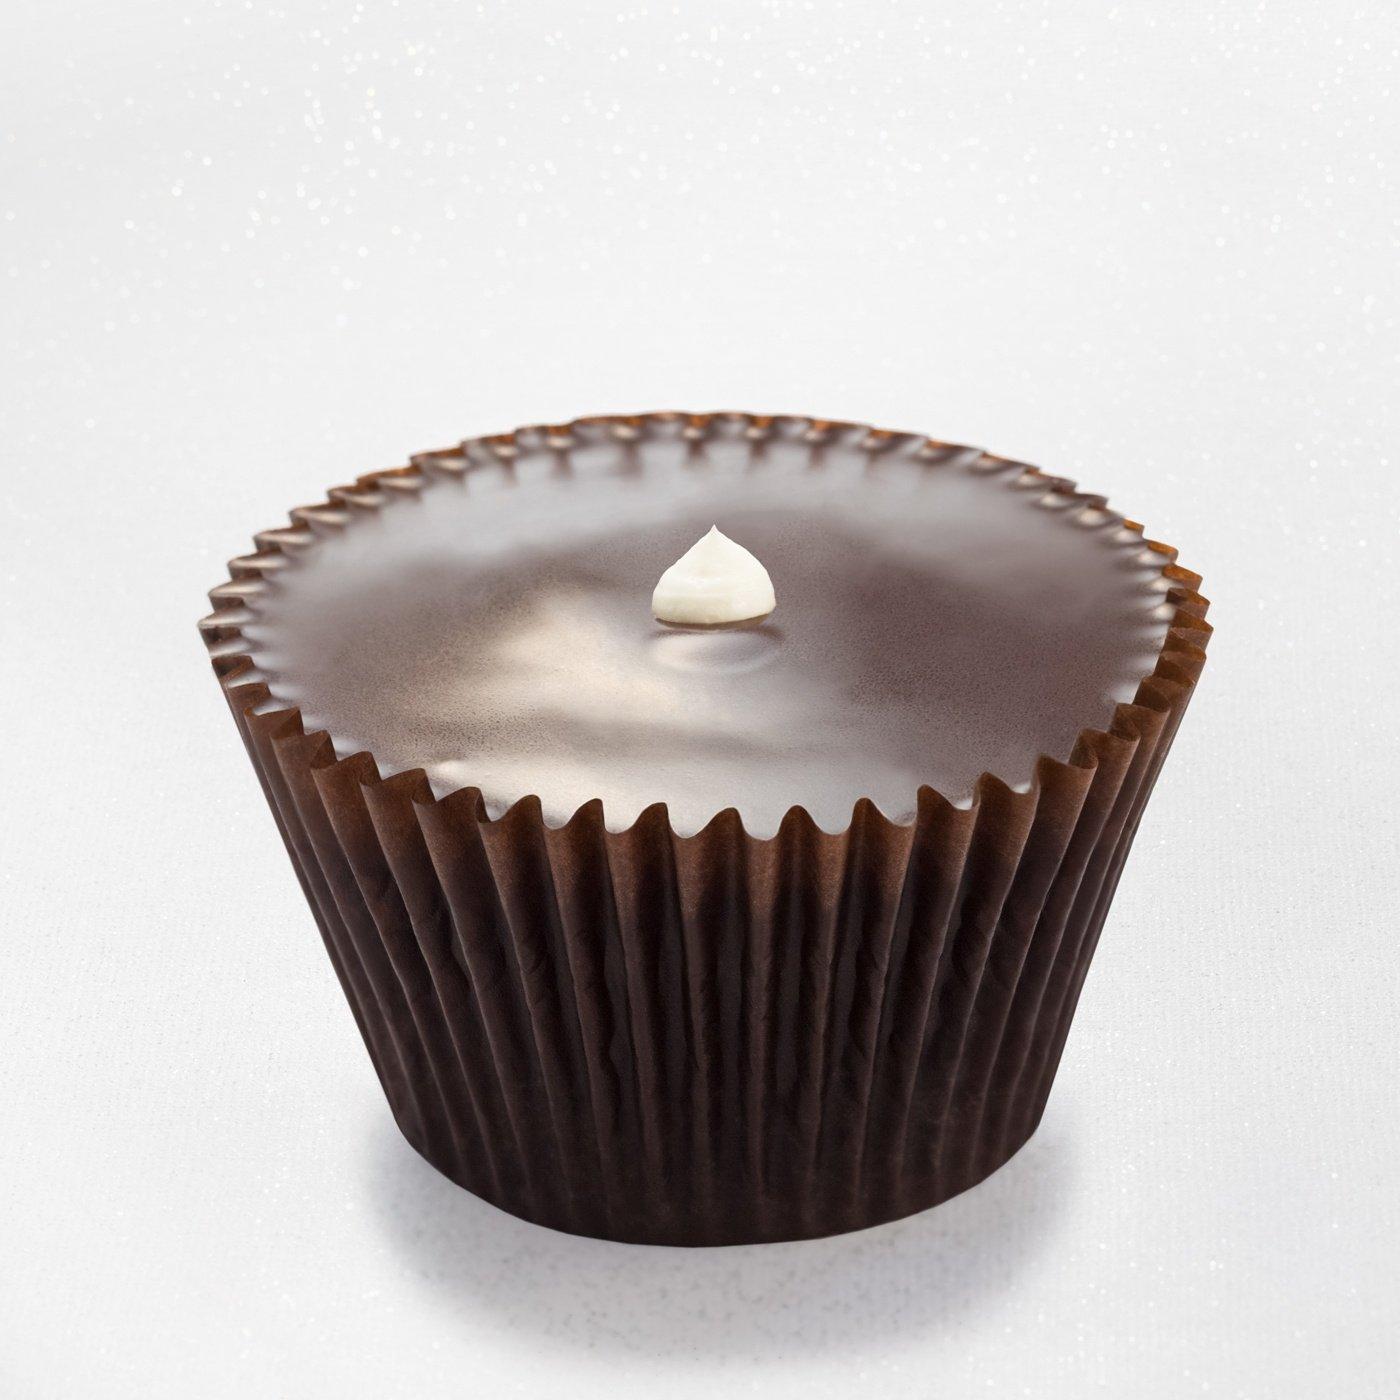 Chocolate cupcake with marshmallow cream